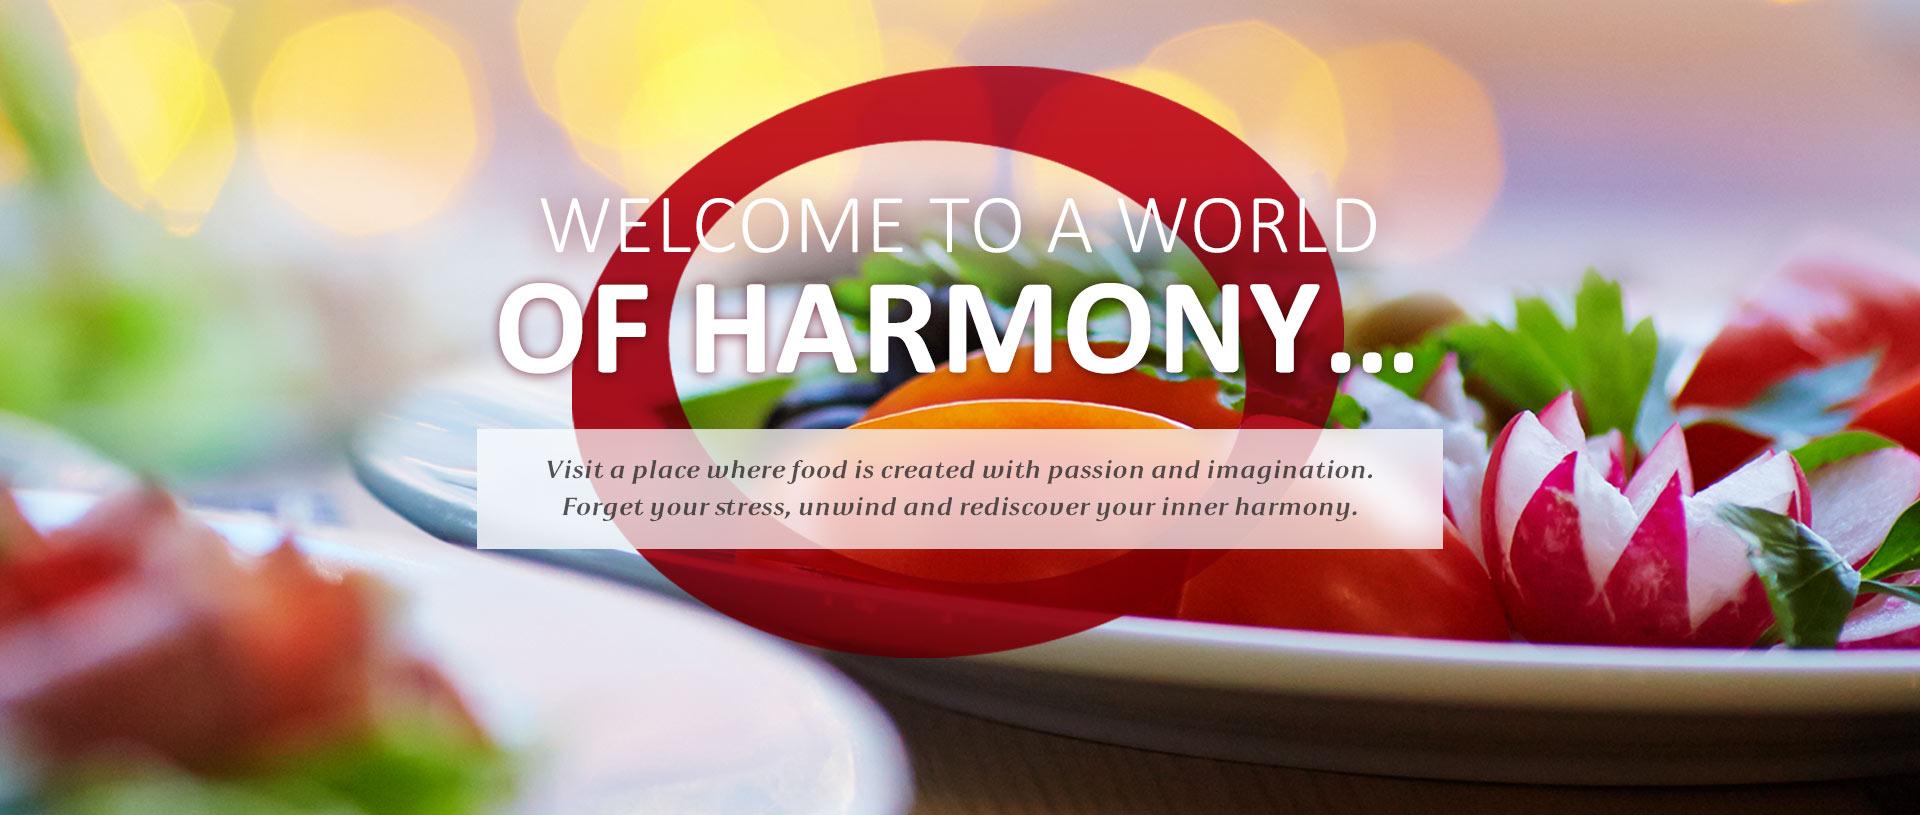 Harmony Restaurant - Fourth slider image